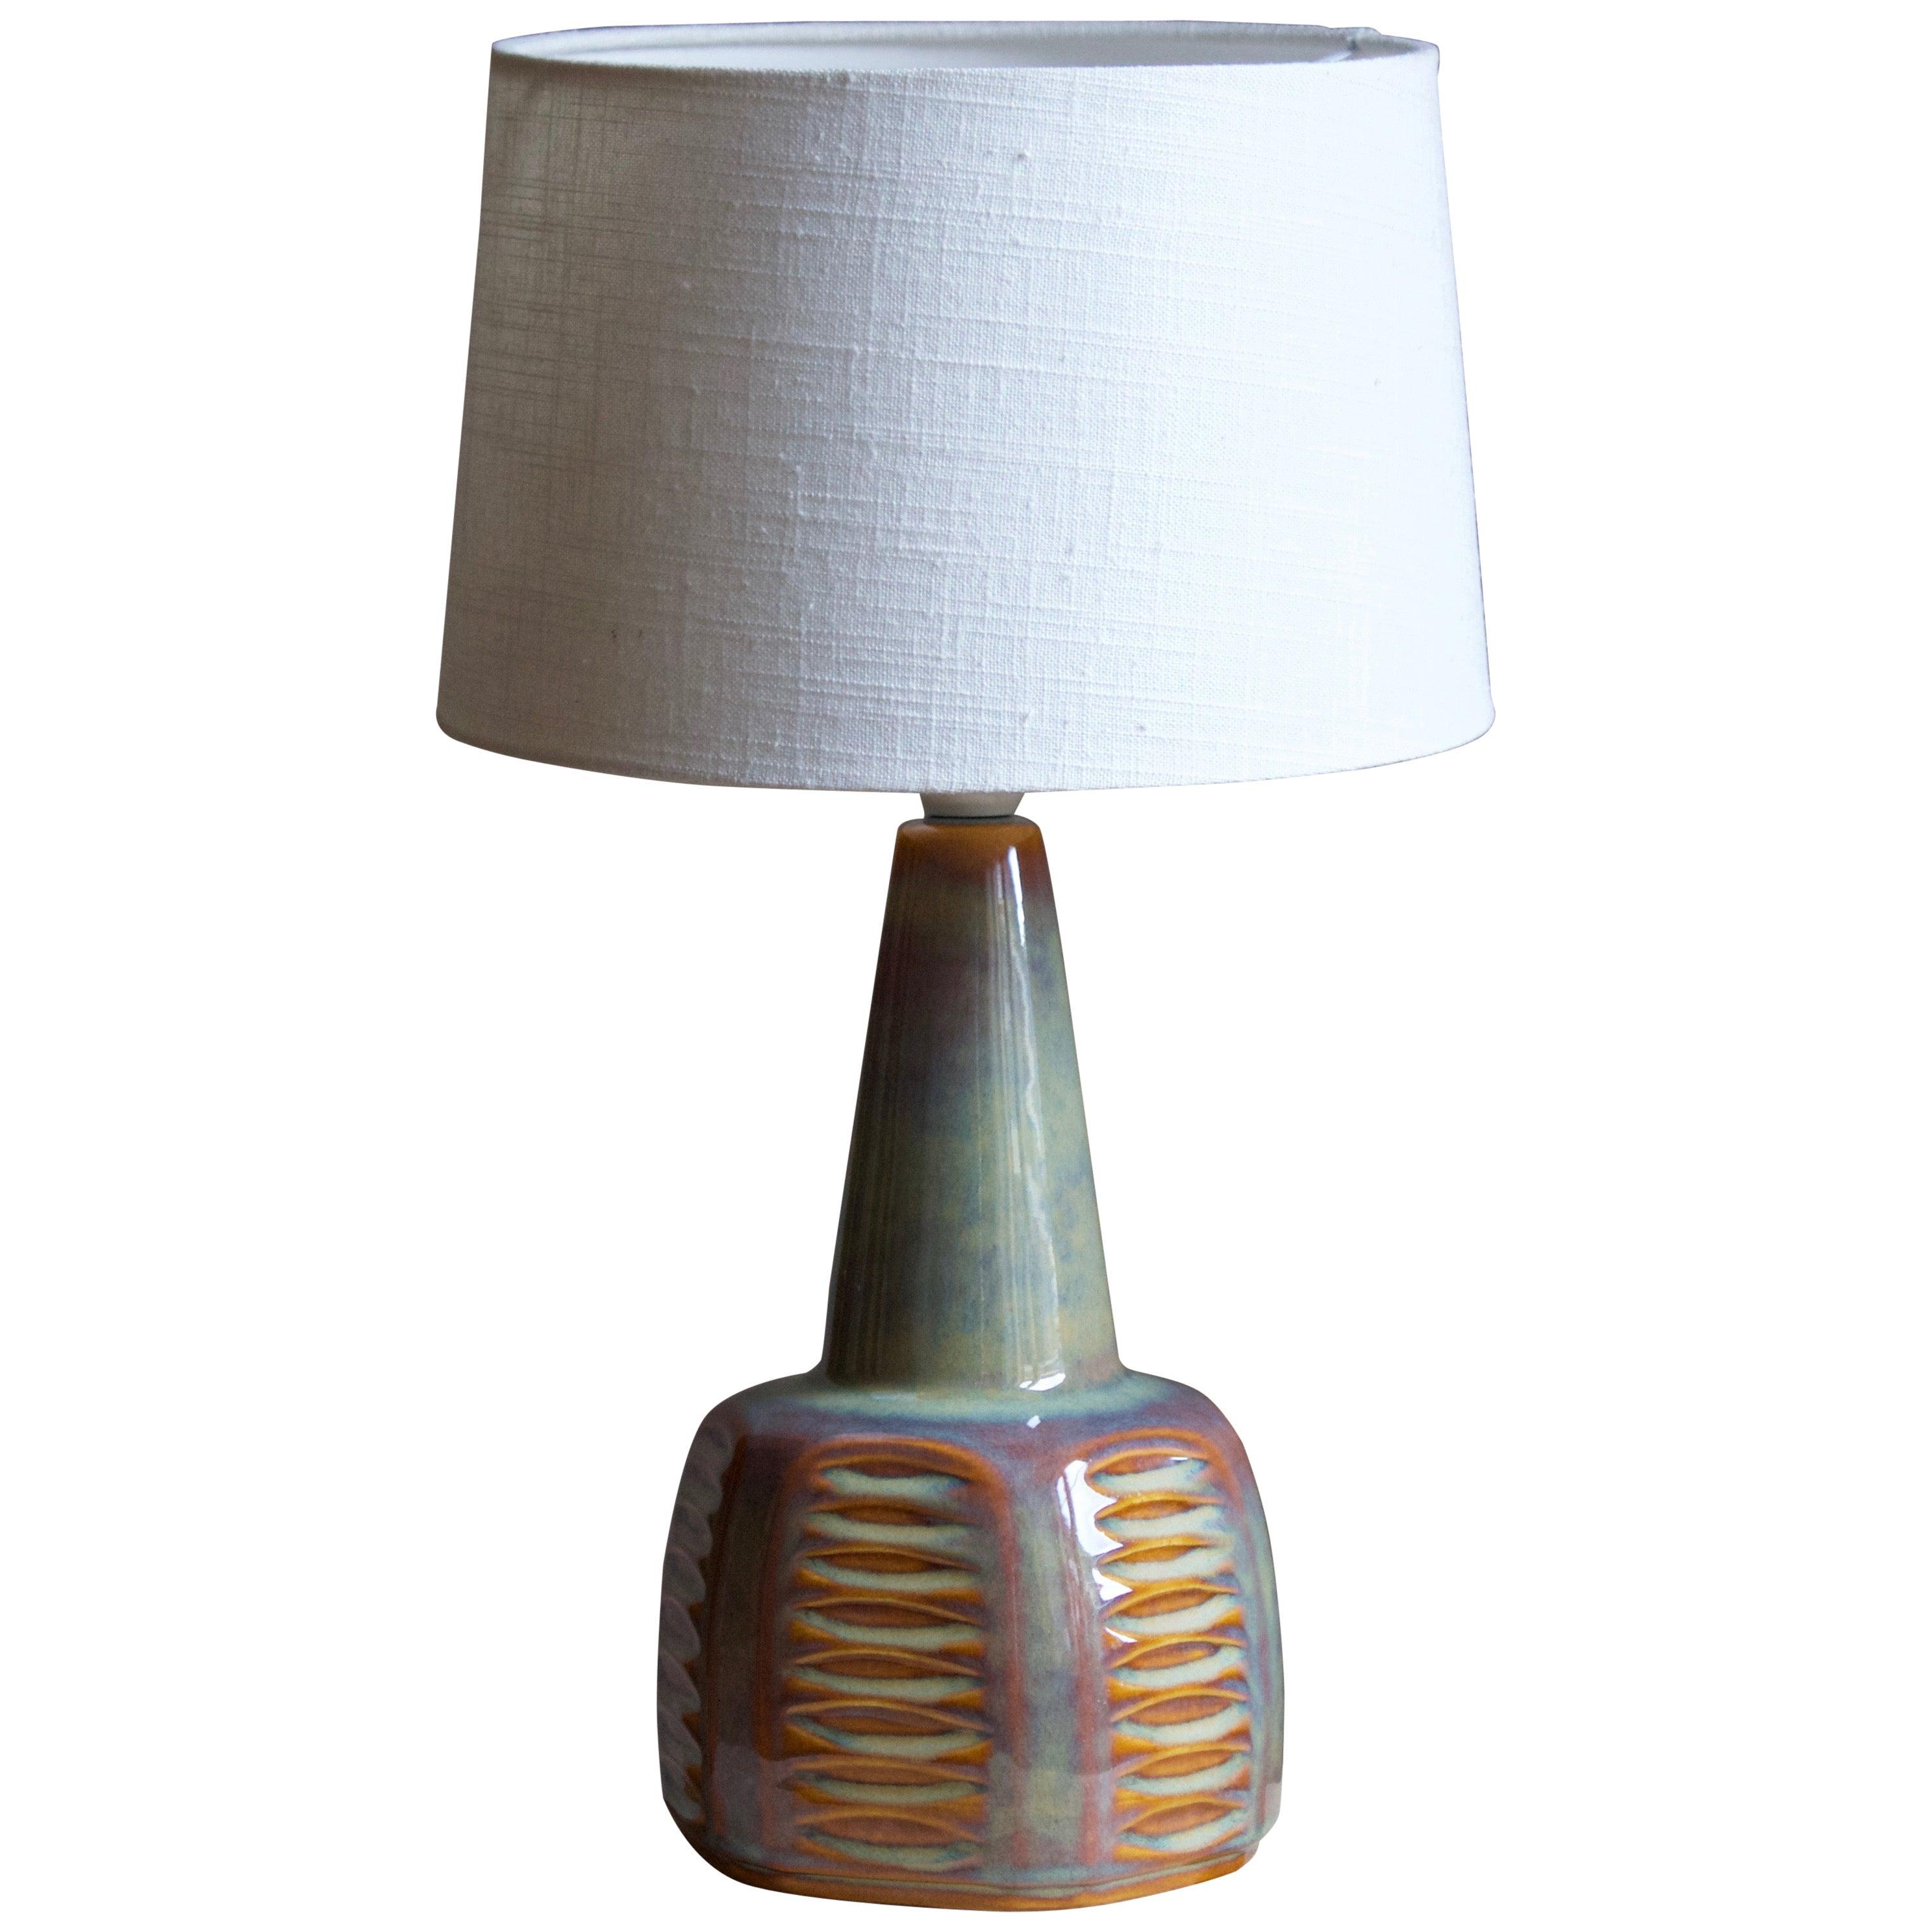 Einar Johansen, Table Lamp, Glazed Incised Stoneware, Søholm, Denmark, 1960s